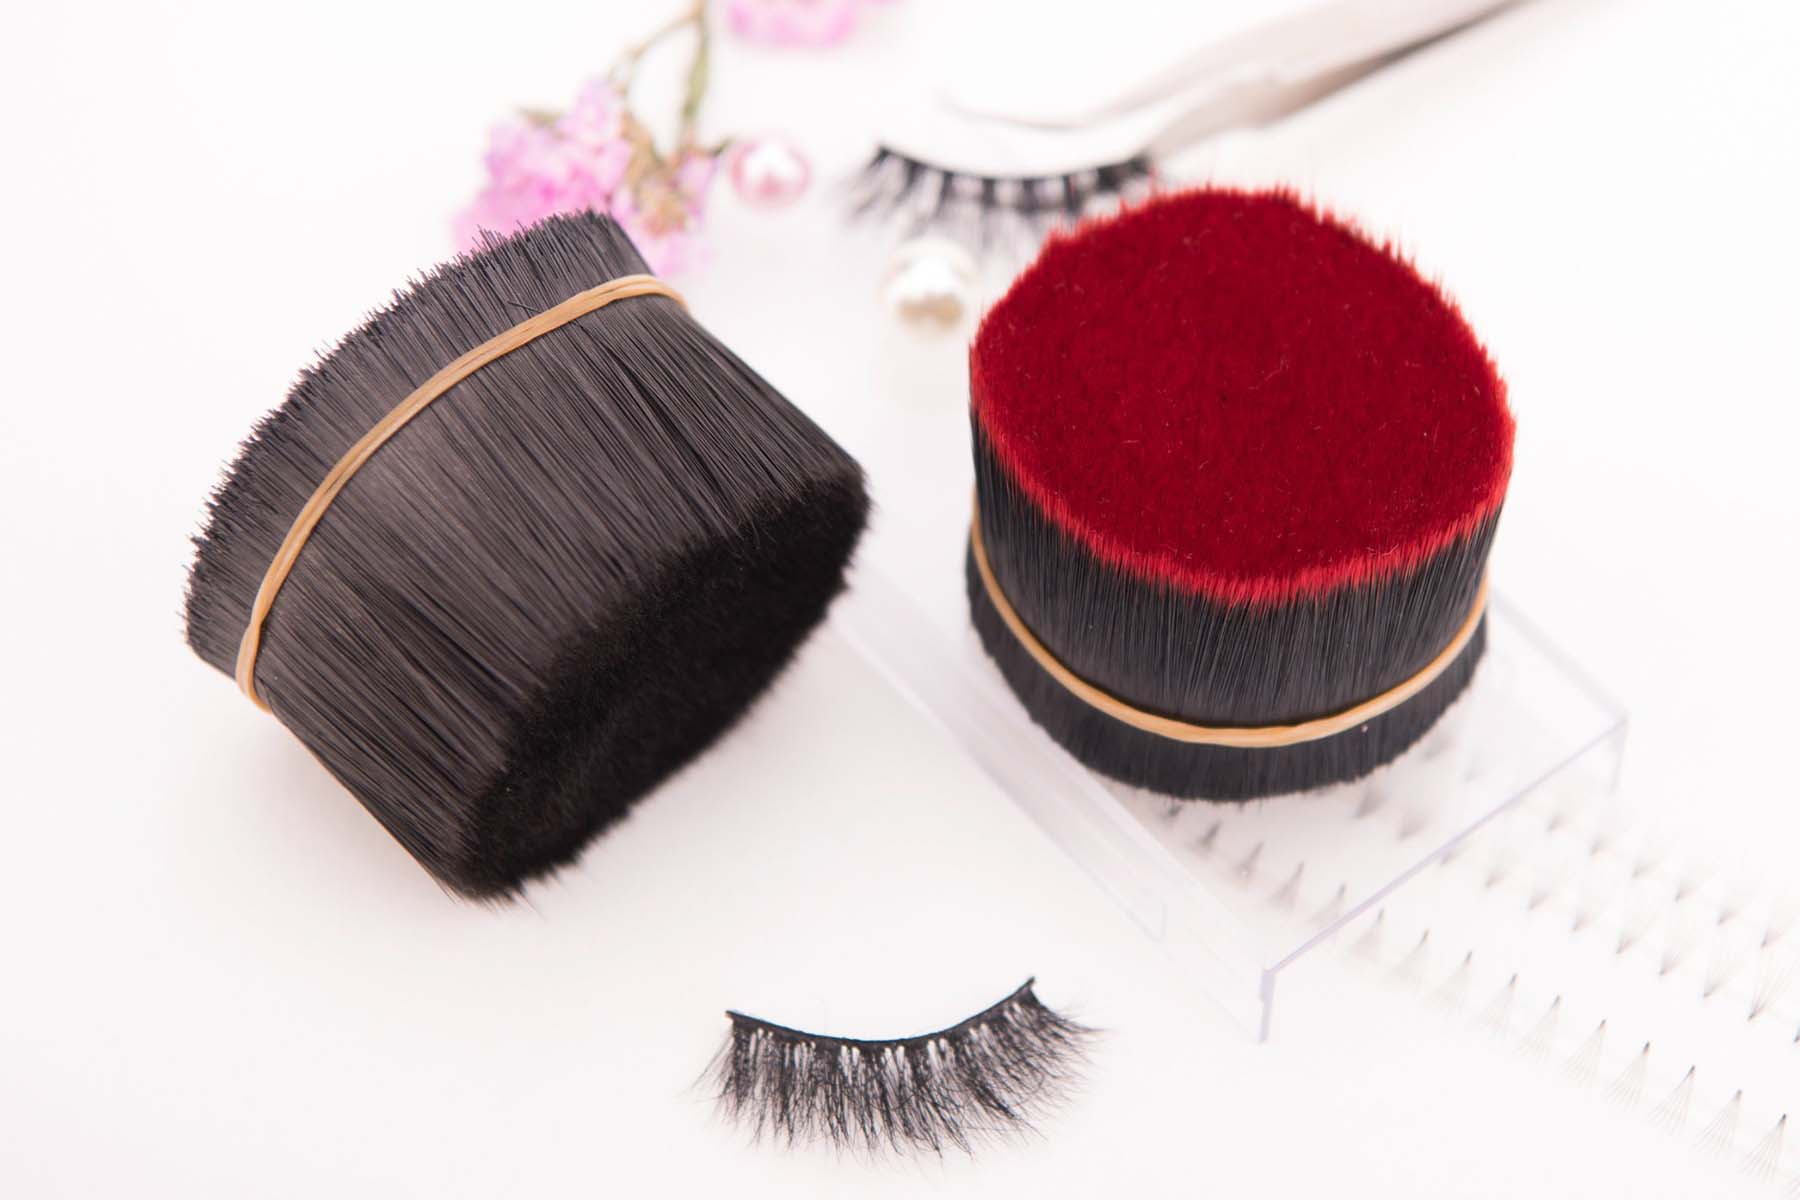 starseed eyelashes materials